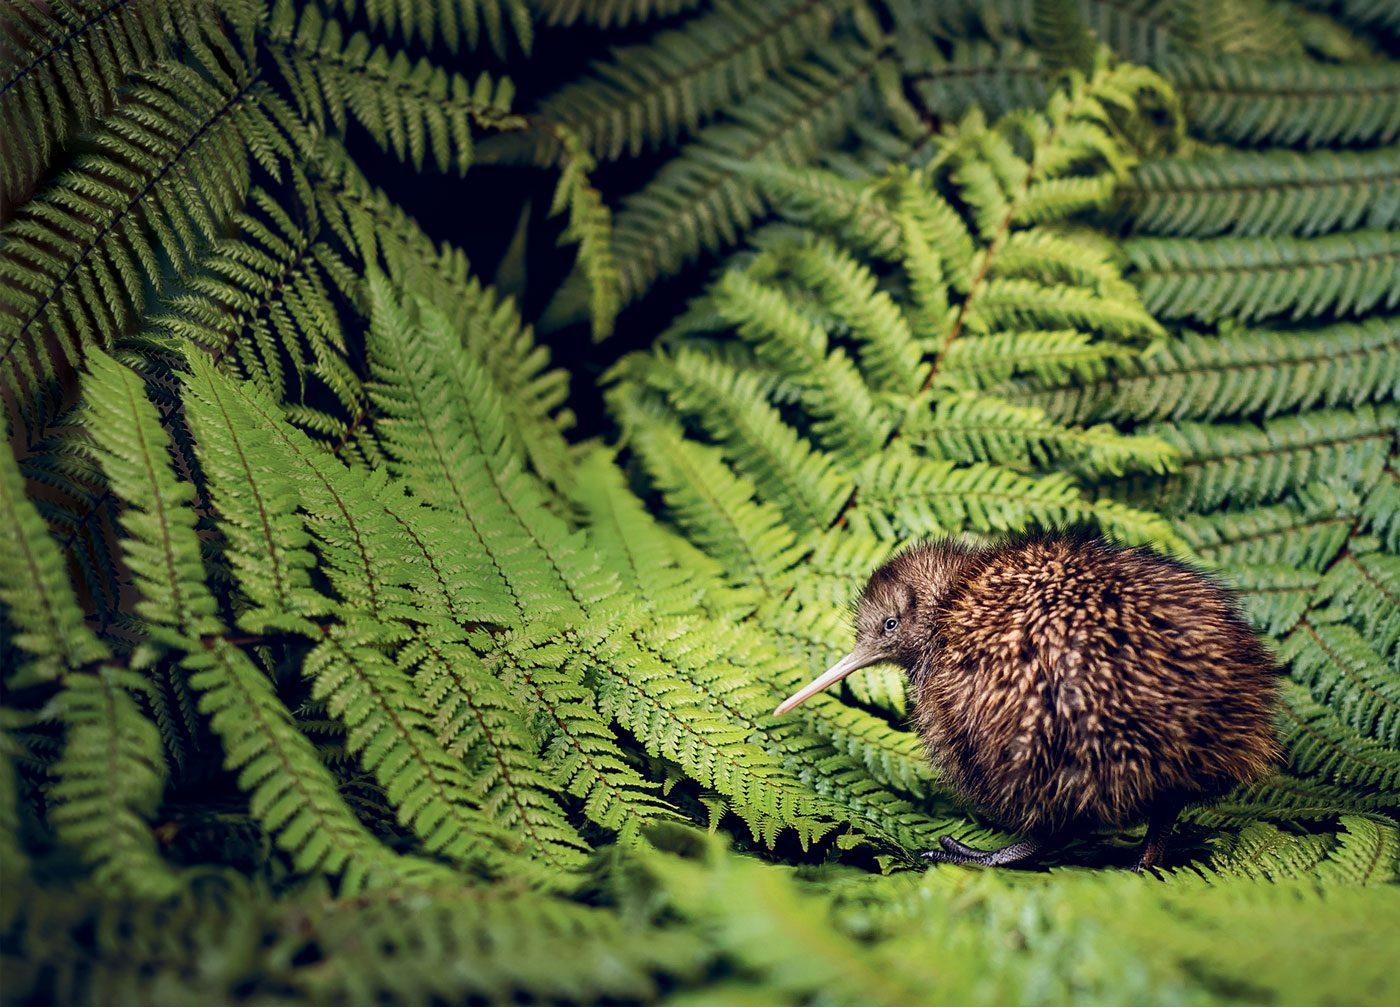 Kiwi bird in trees